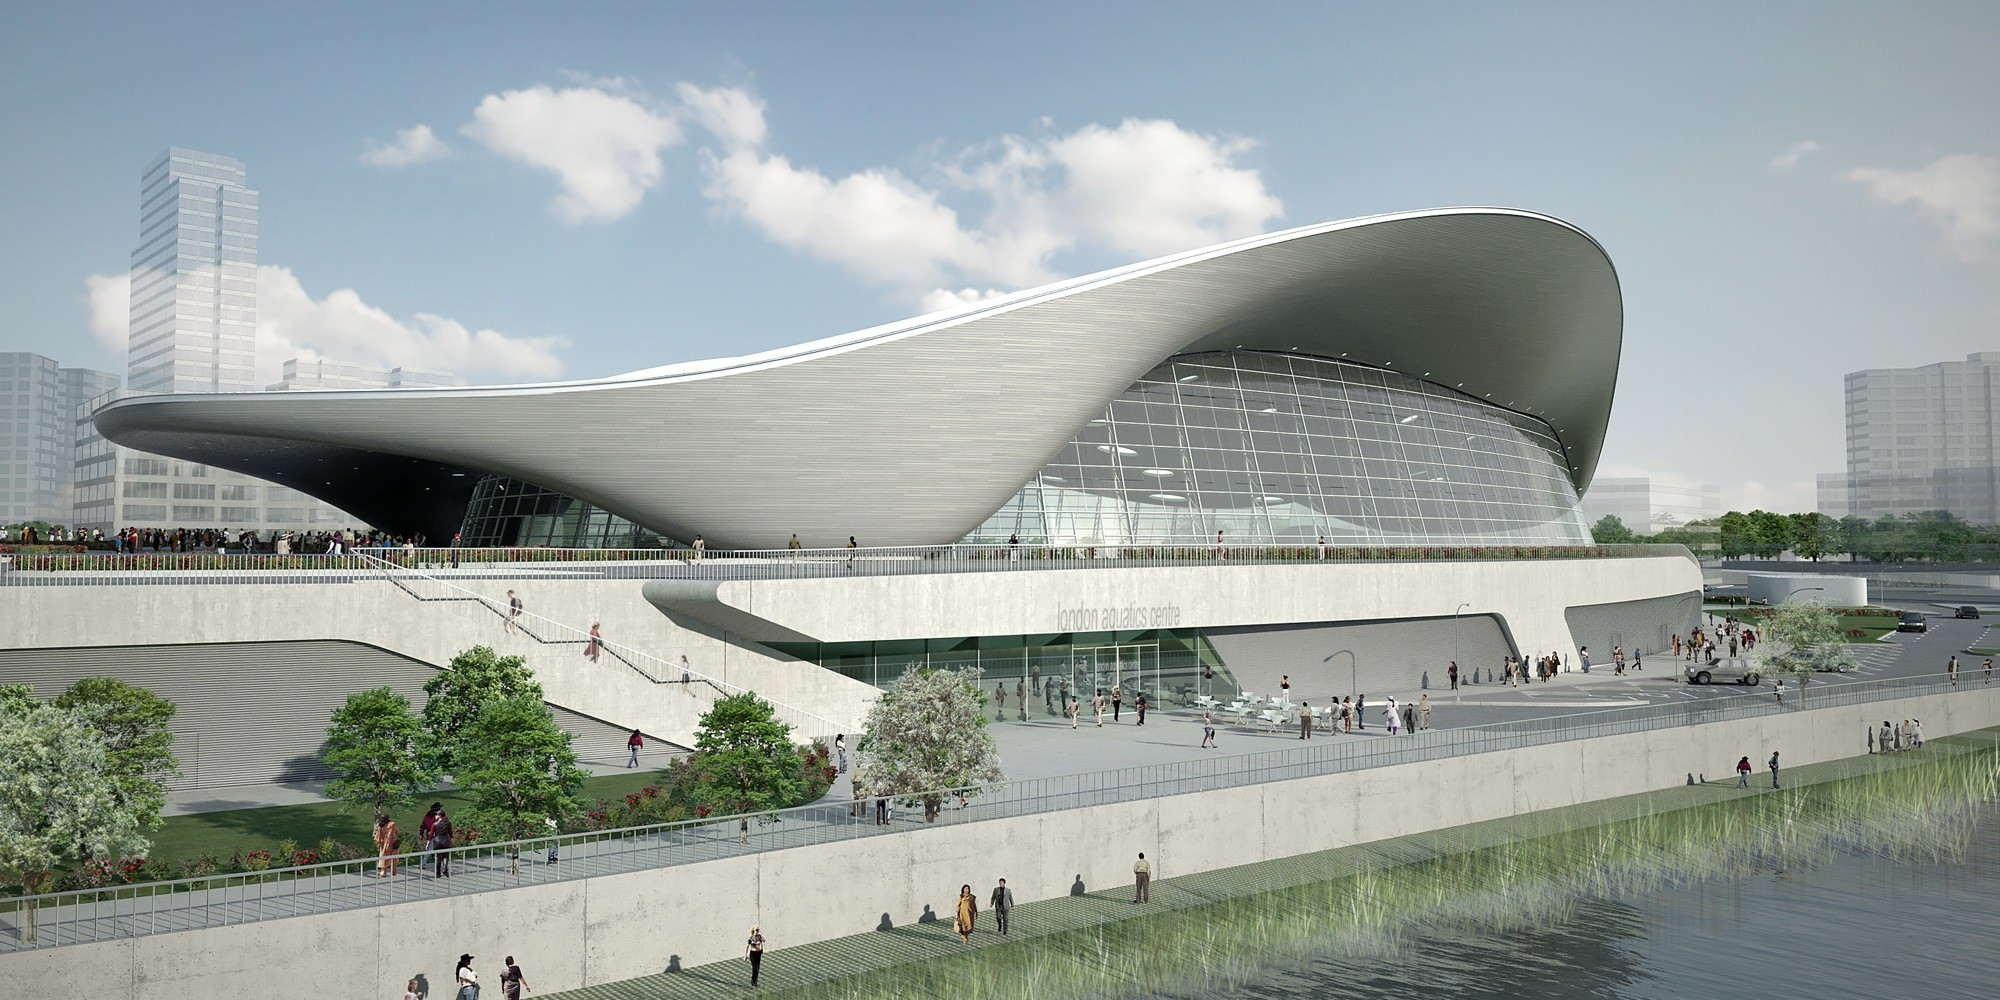 Zaha Hadid Design Concepts And Theory explore zaha hadid's bold, iconic and sustainable architecture